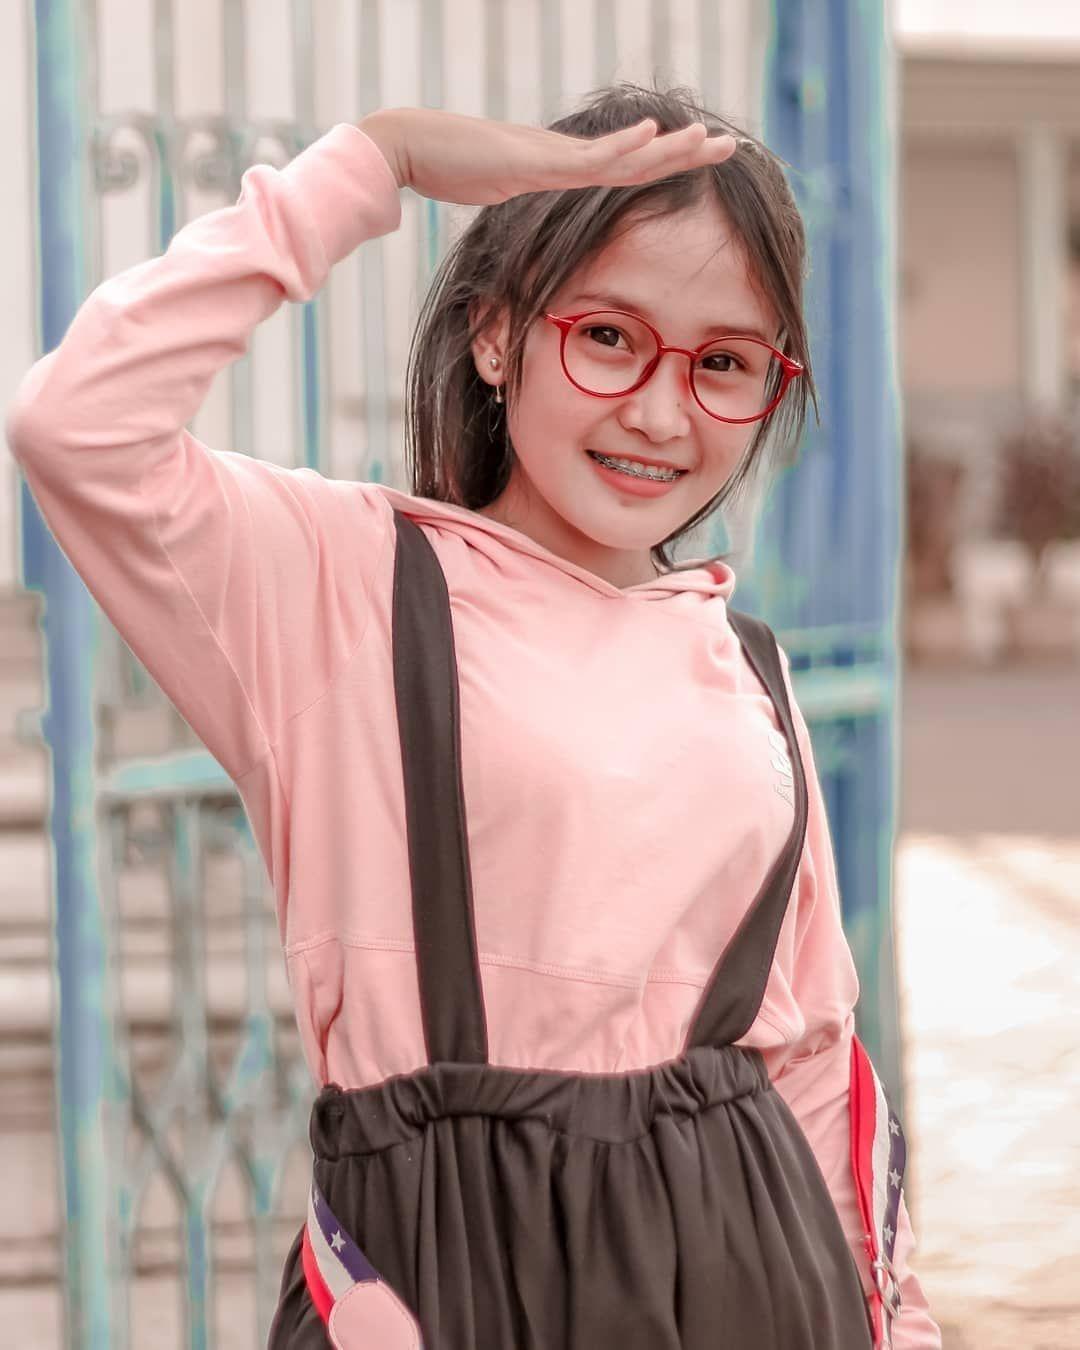 Agen Resmi Sbobet I1bet88 Ibcbet Dan Cbet Link Website Www Dewabo365 Net New Member 10 Next Deposit 5 Cashback 5 Gadis Cantik Gadis Cantik Asia Gambar